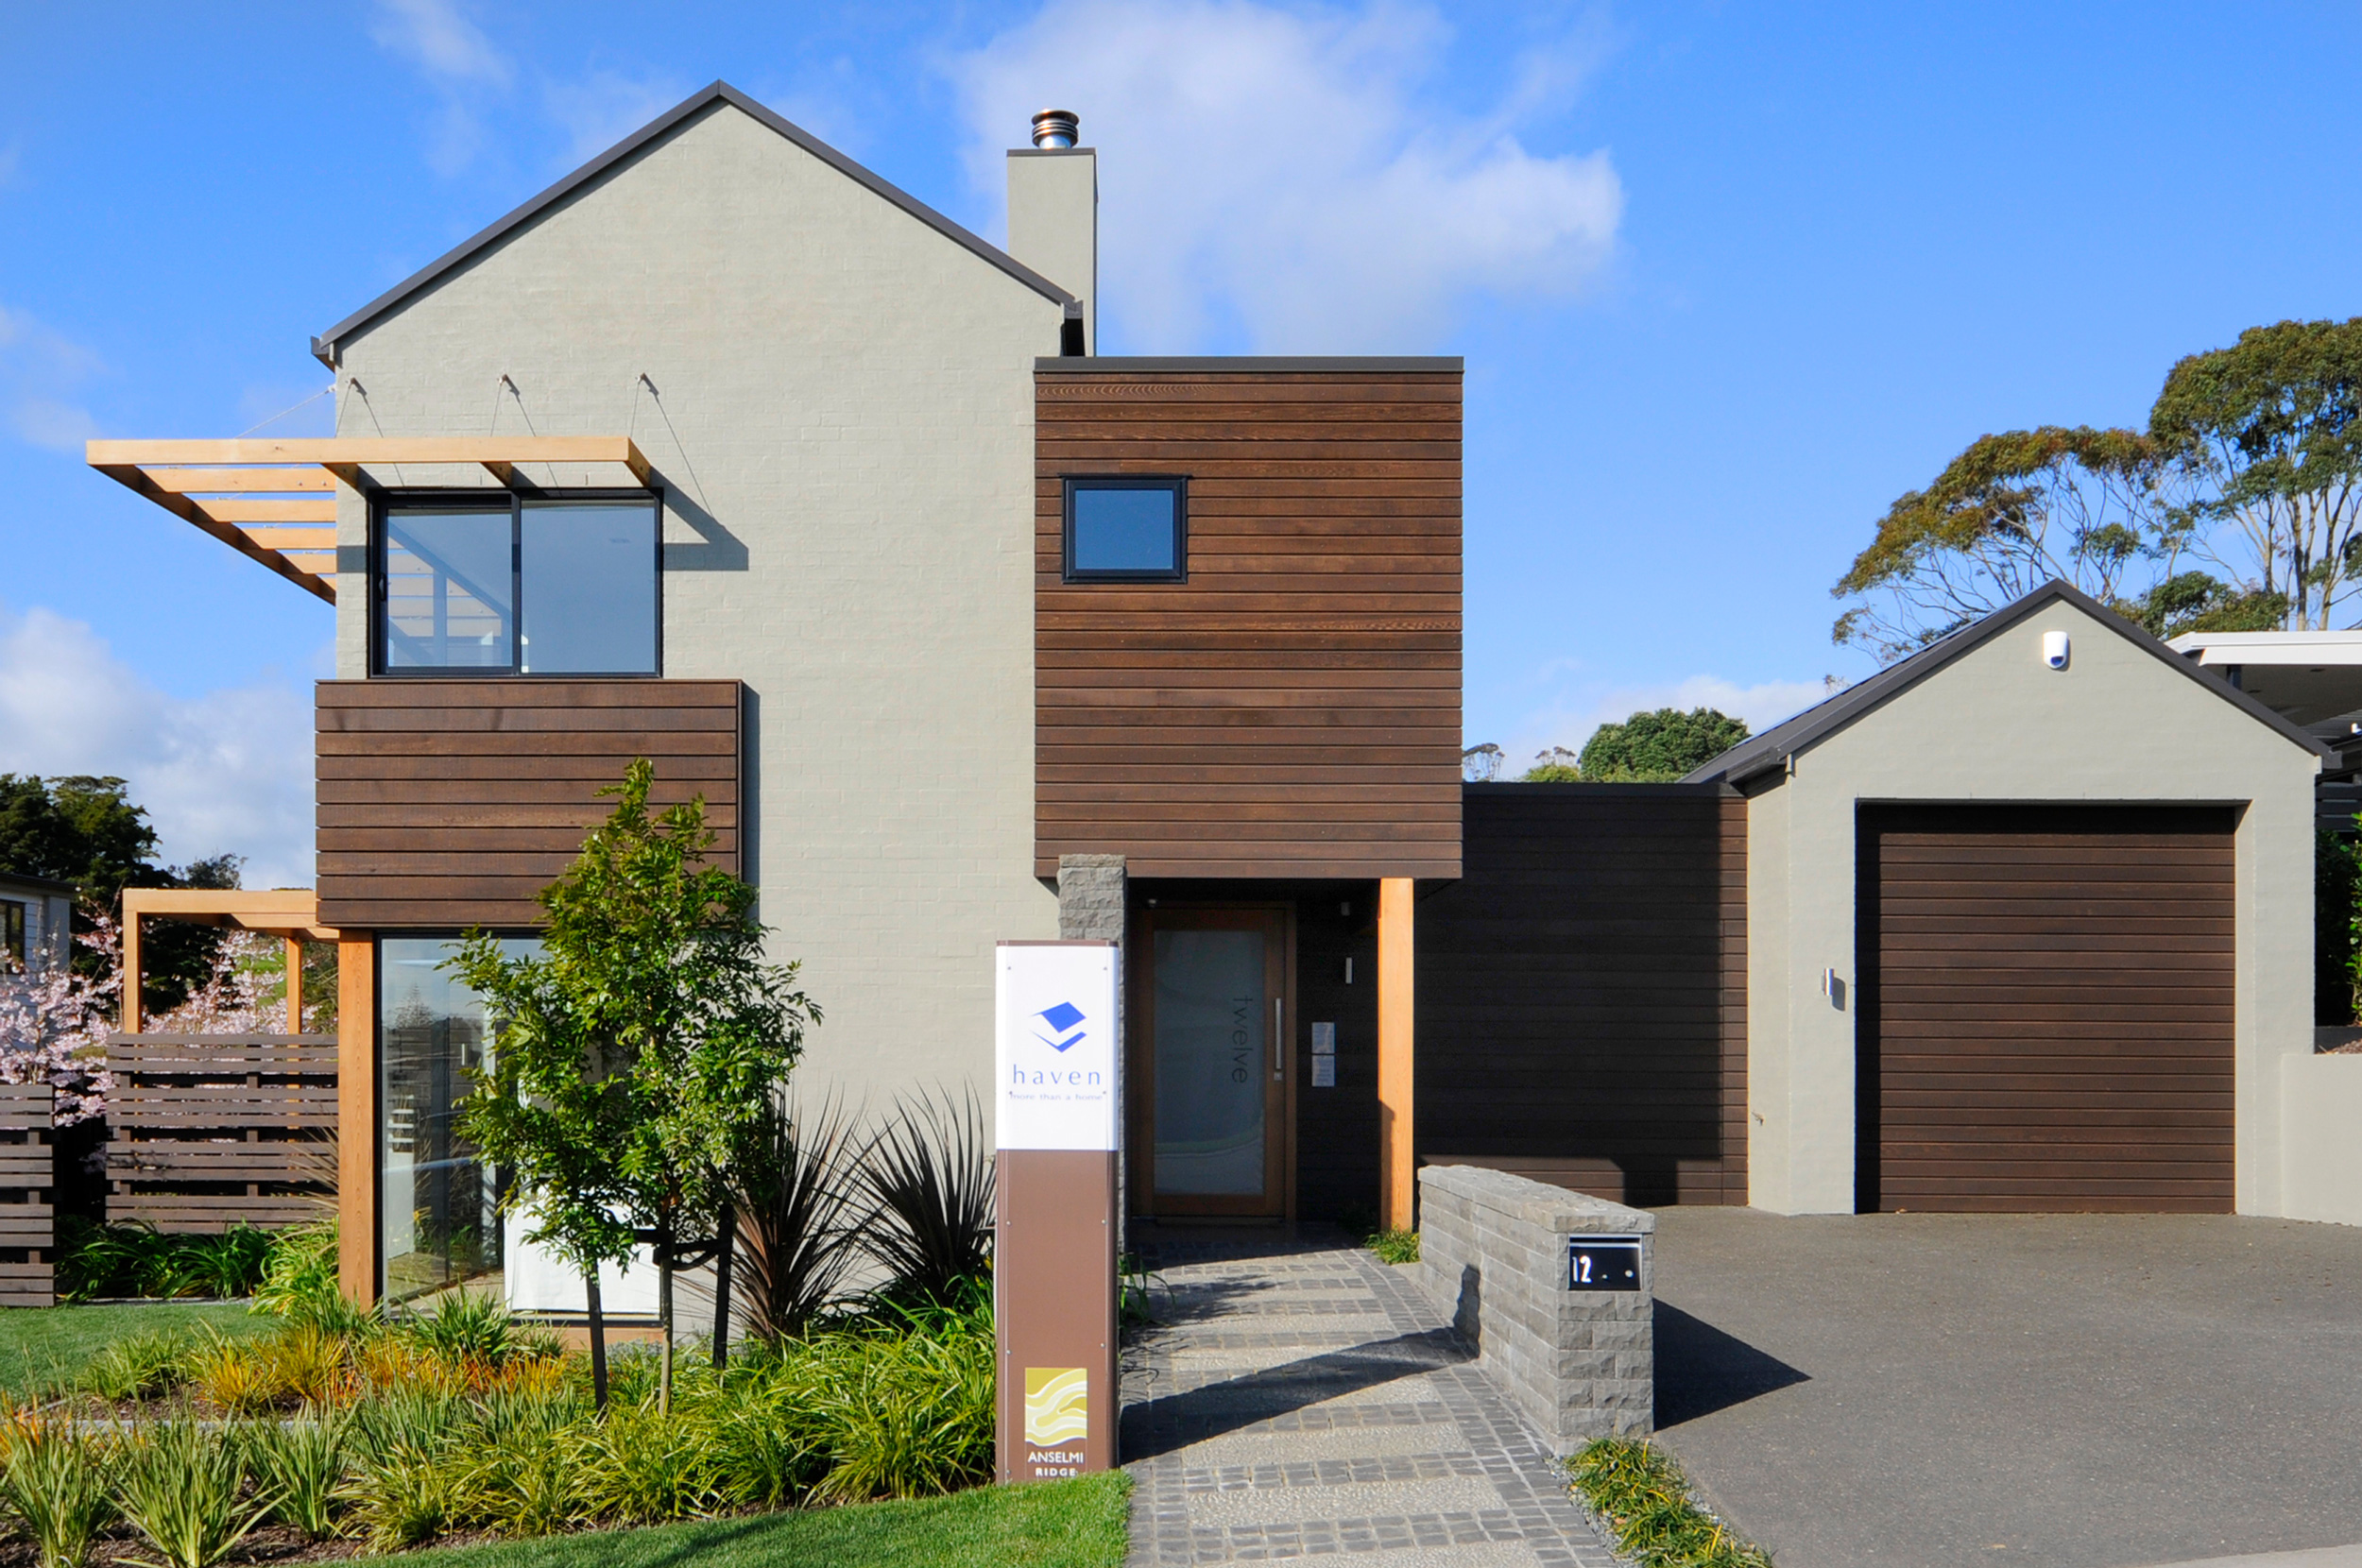 haven-builder-residential-anselmi-ridge-1.jpg